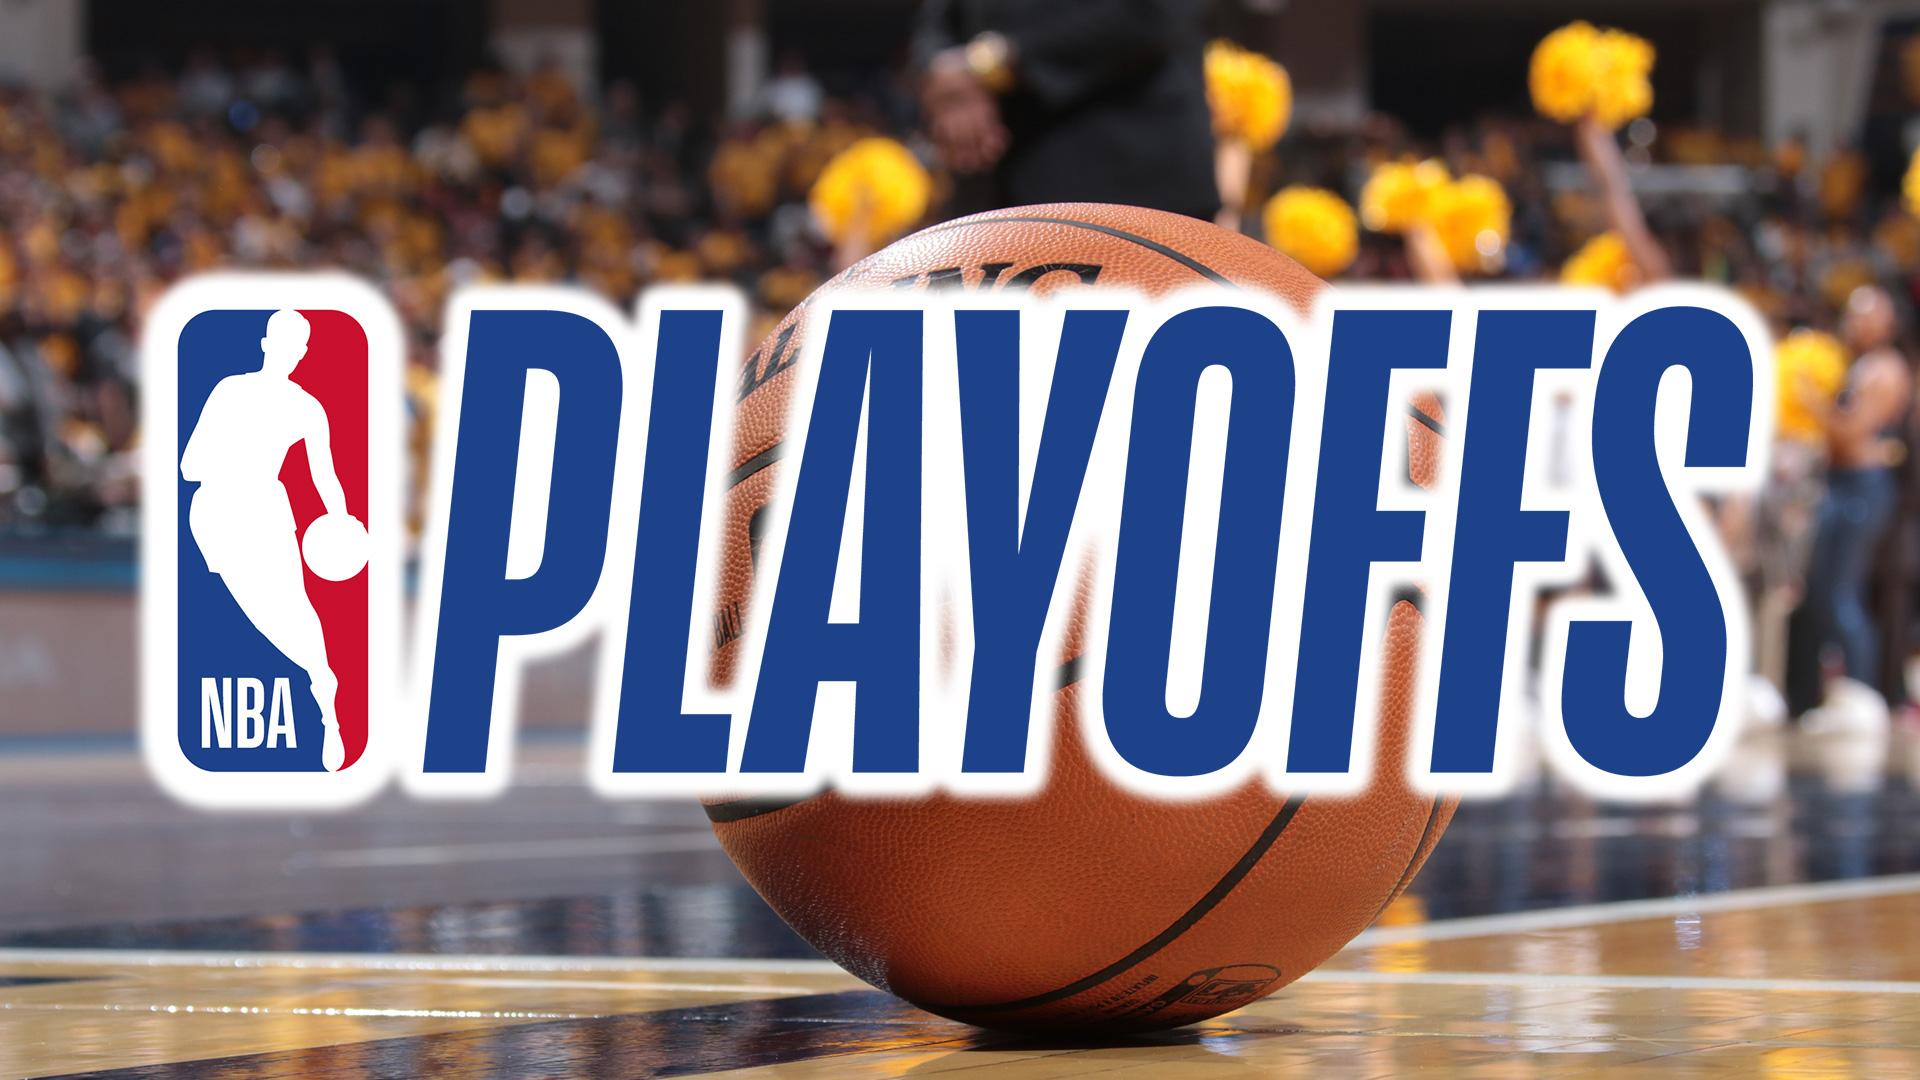 NBAバスケットボール プレーオフ中継2017-18